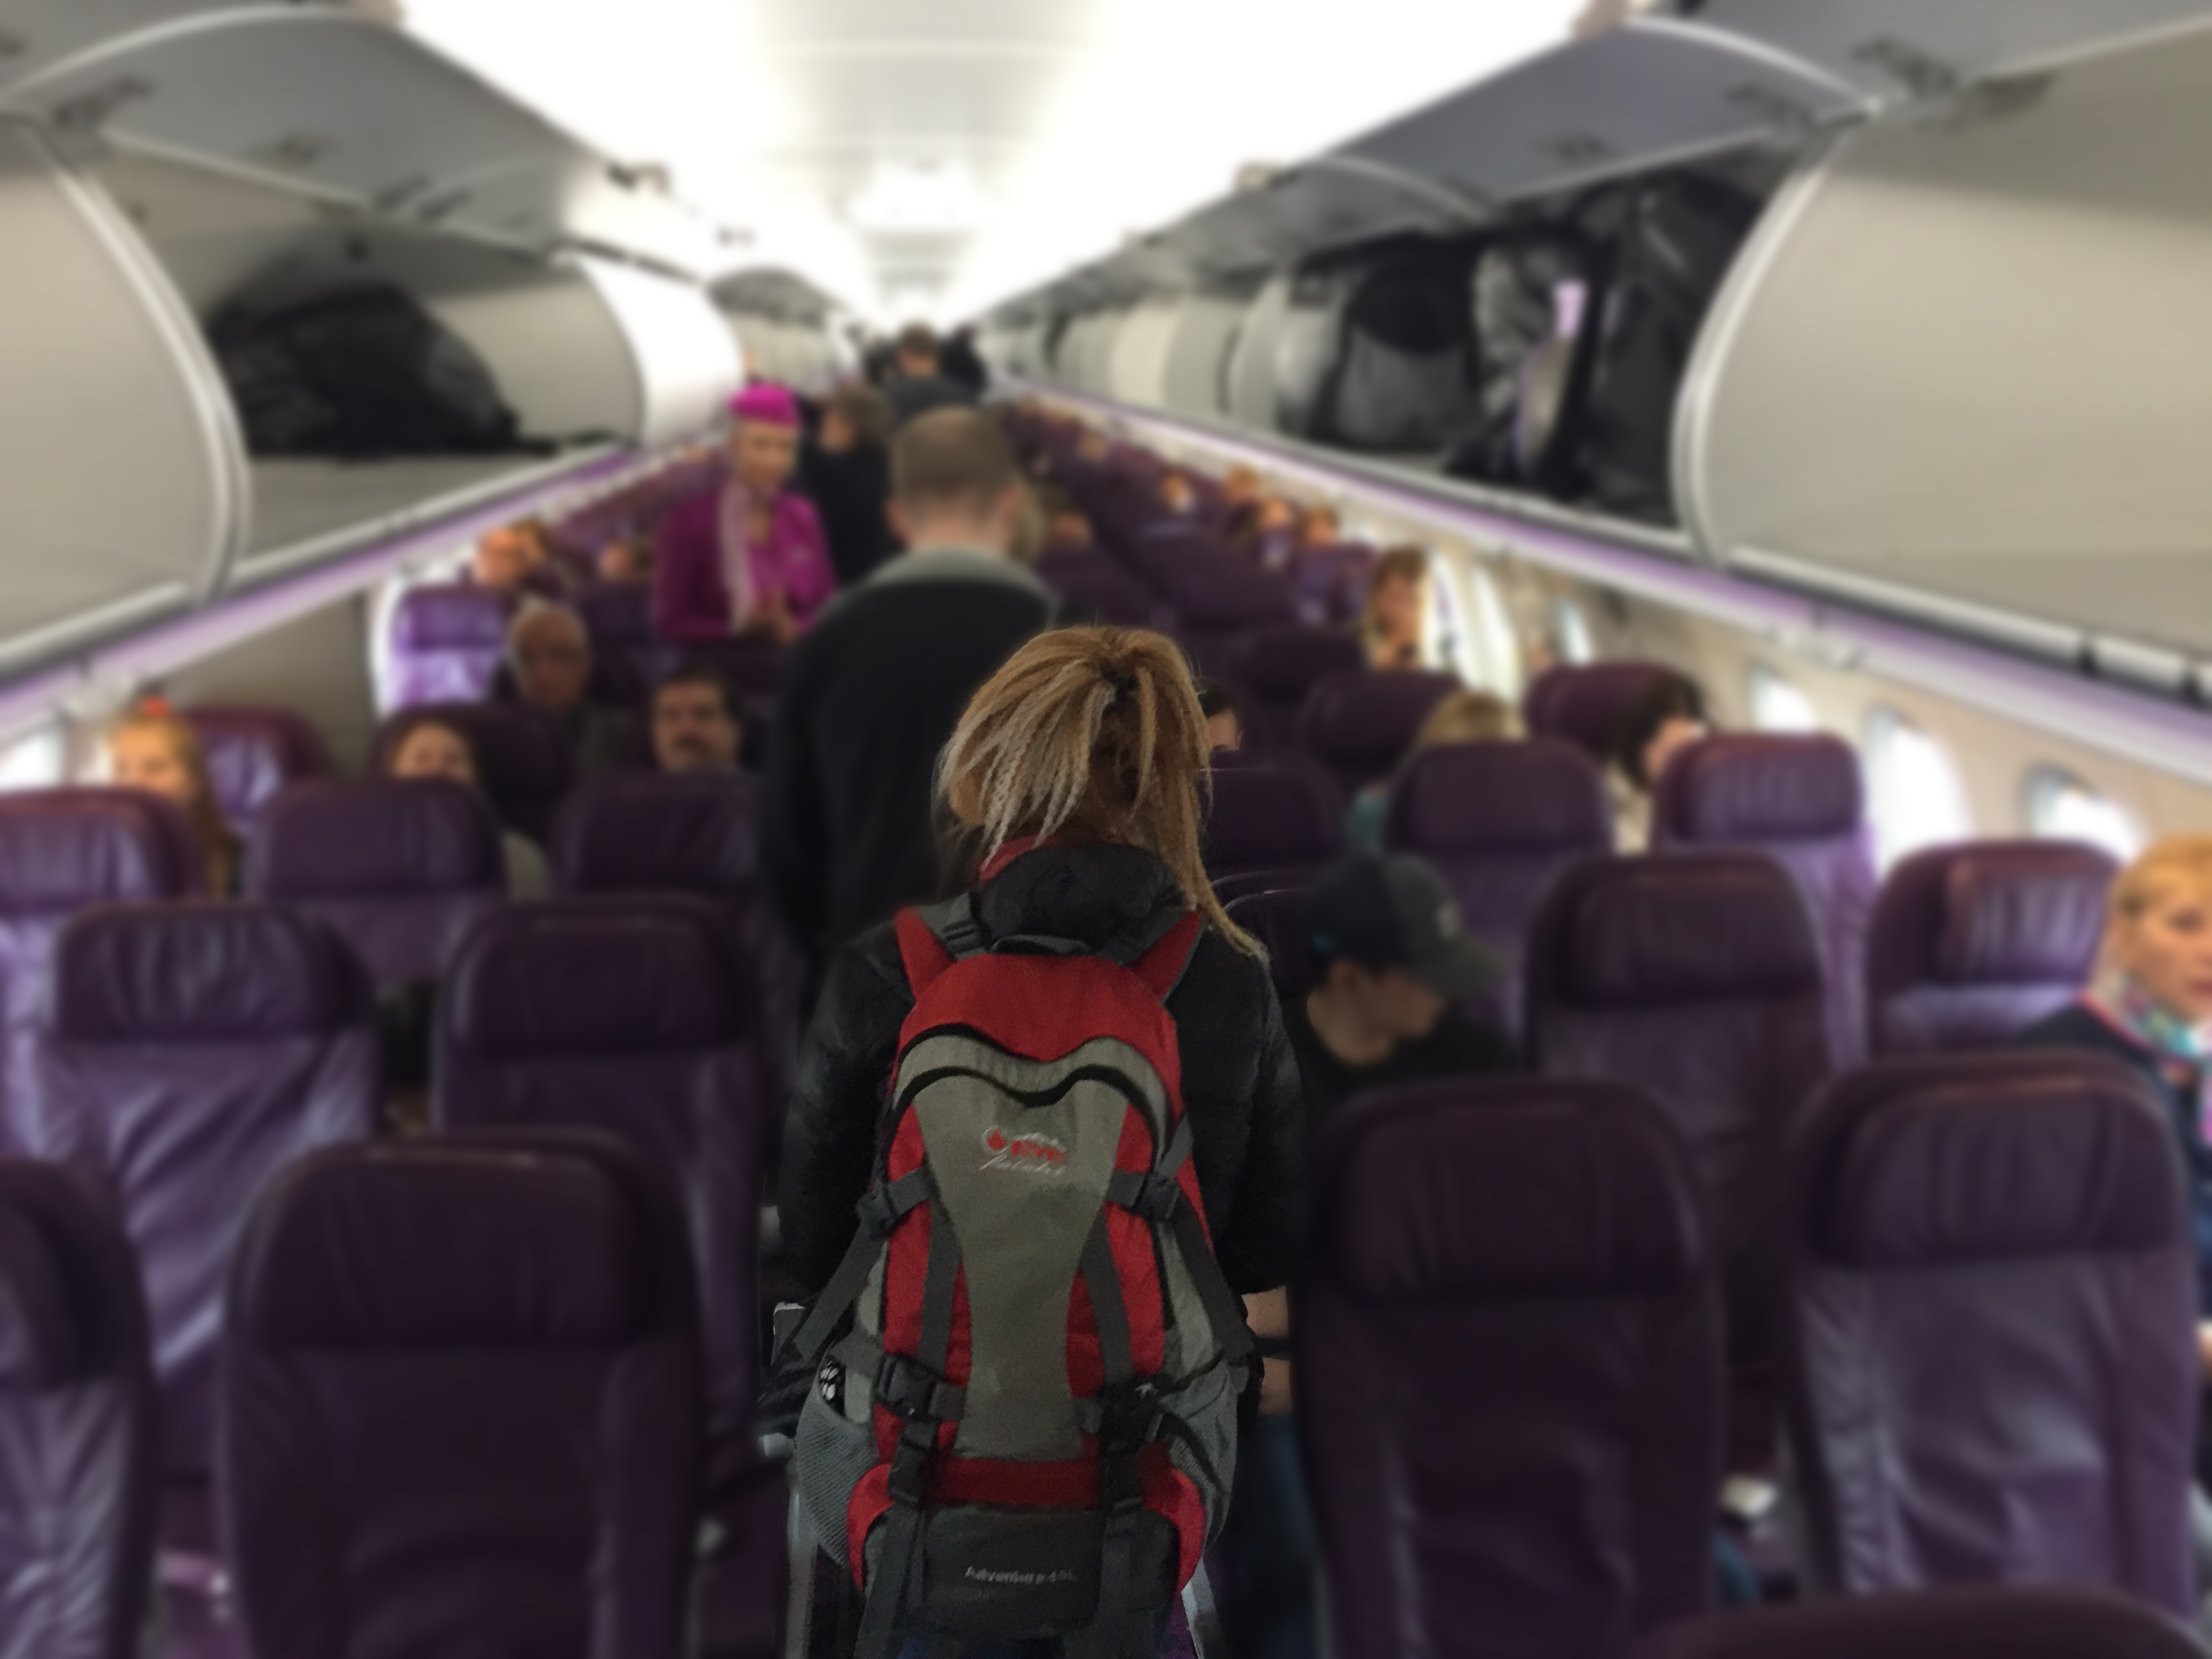 person walking down aisle in an airplane